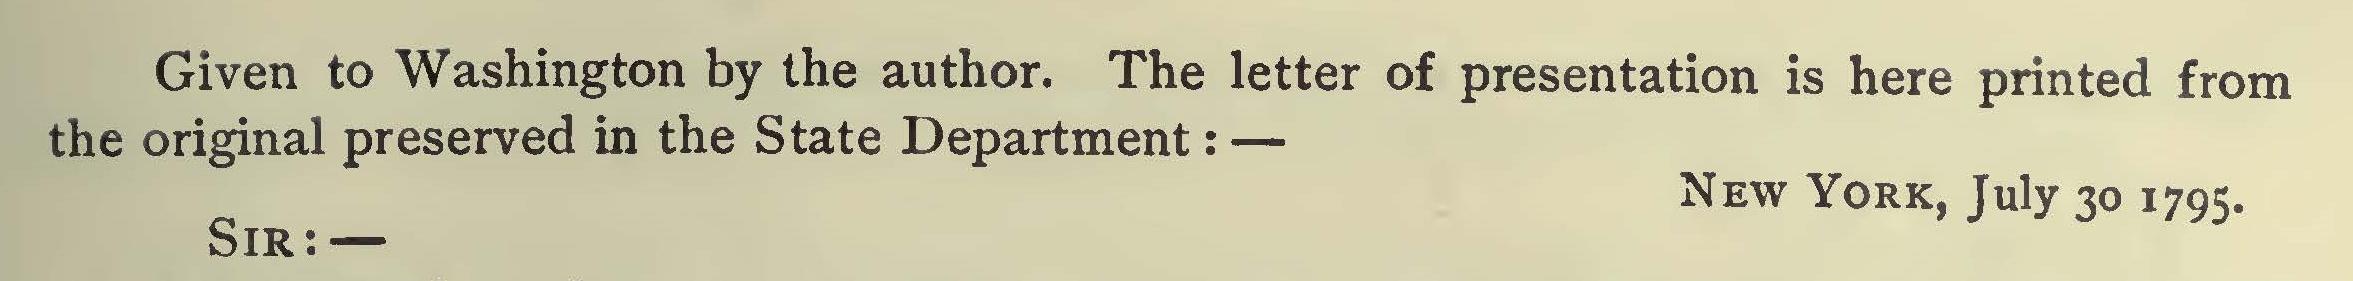 Miller, Samuel, July 30, 1795 Letter to George Washington Title Page.jpg